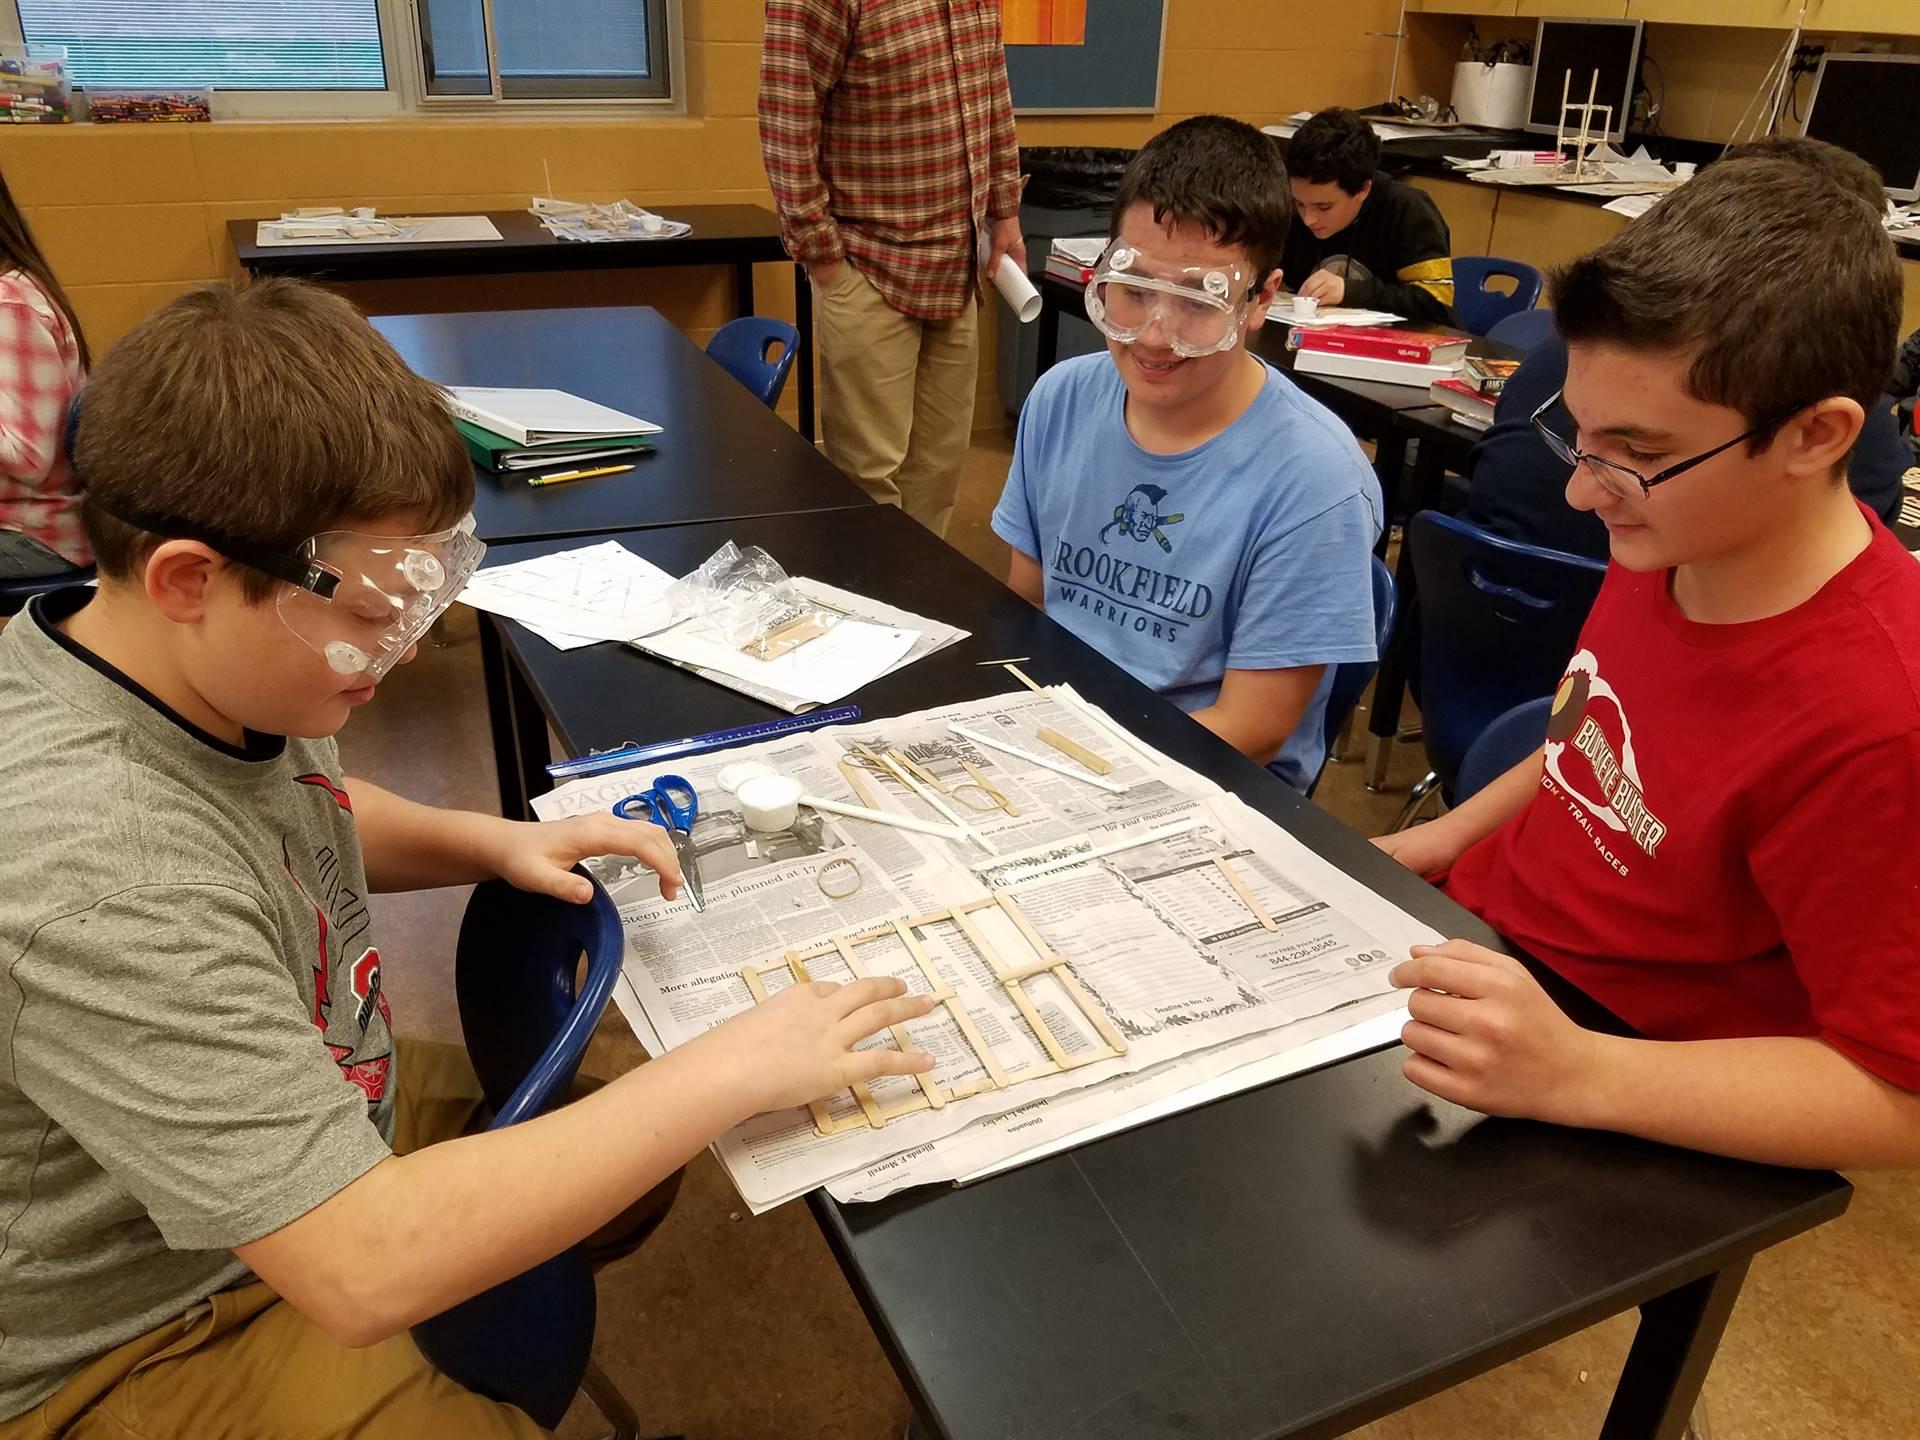 eighth grade science class